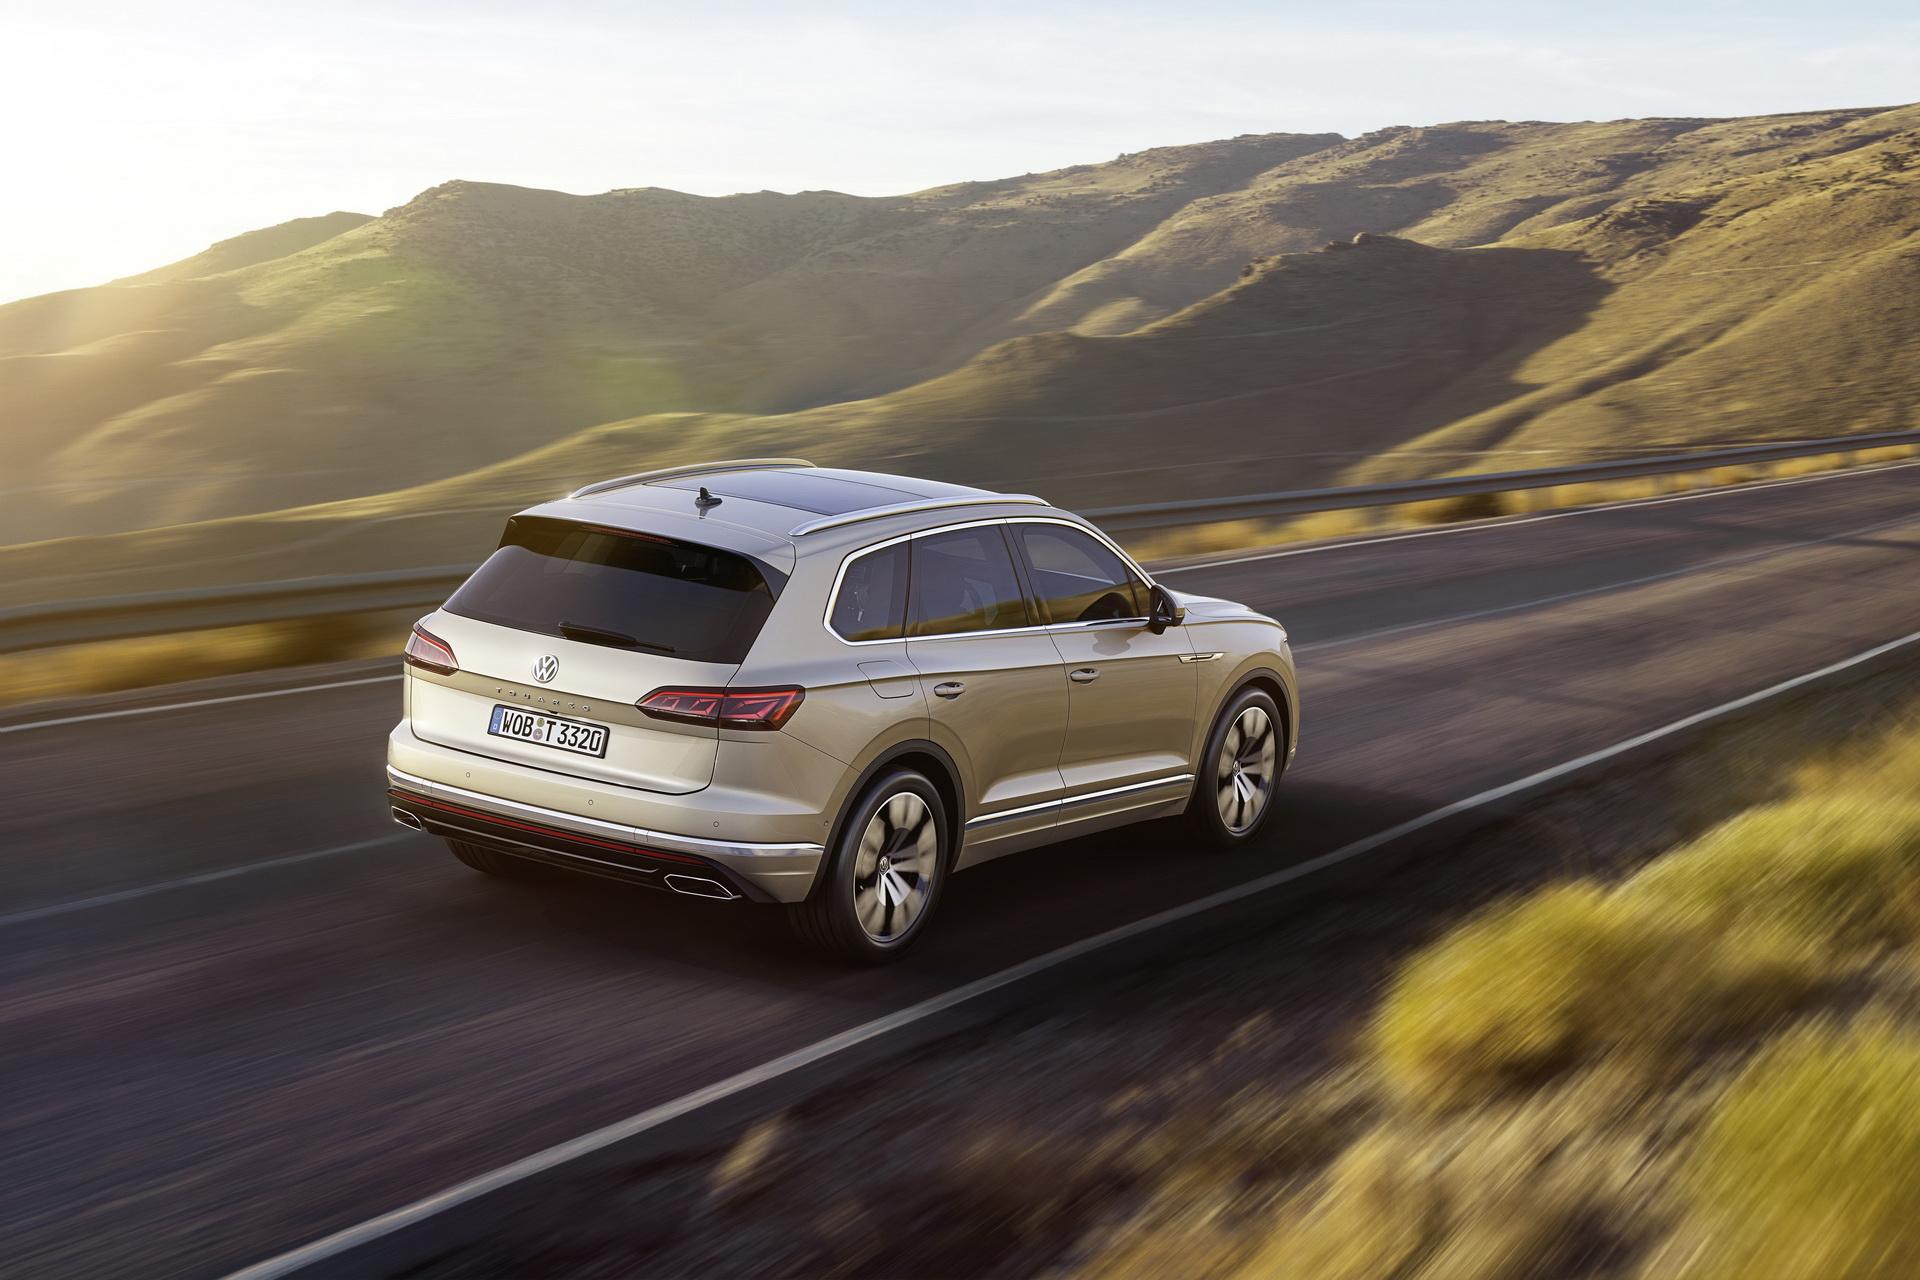 Volkswagen Touareg 2018 (8)